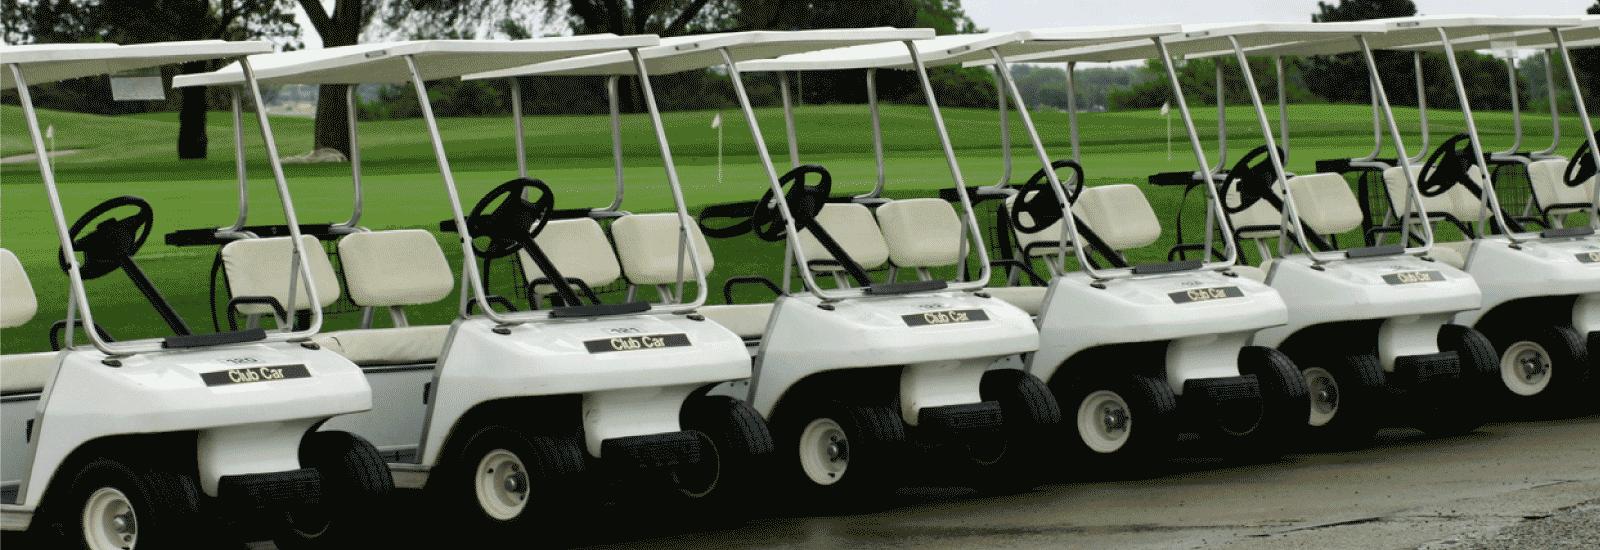 Holloman AFB Golf Course